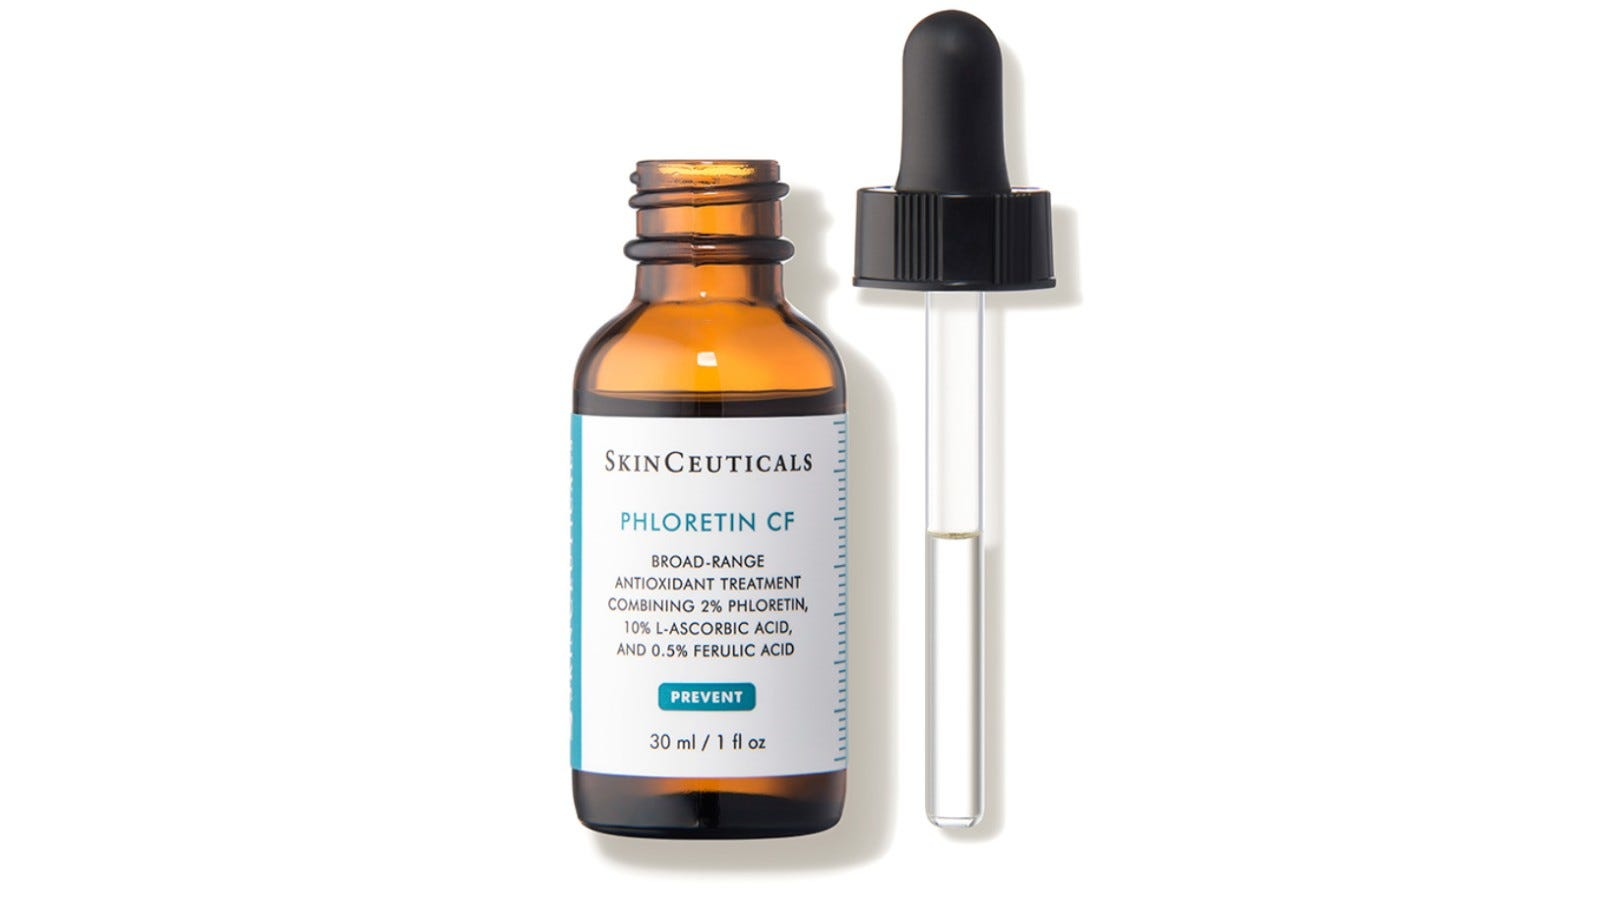 glass bottle of Skinceuticals serum